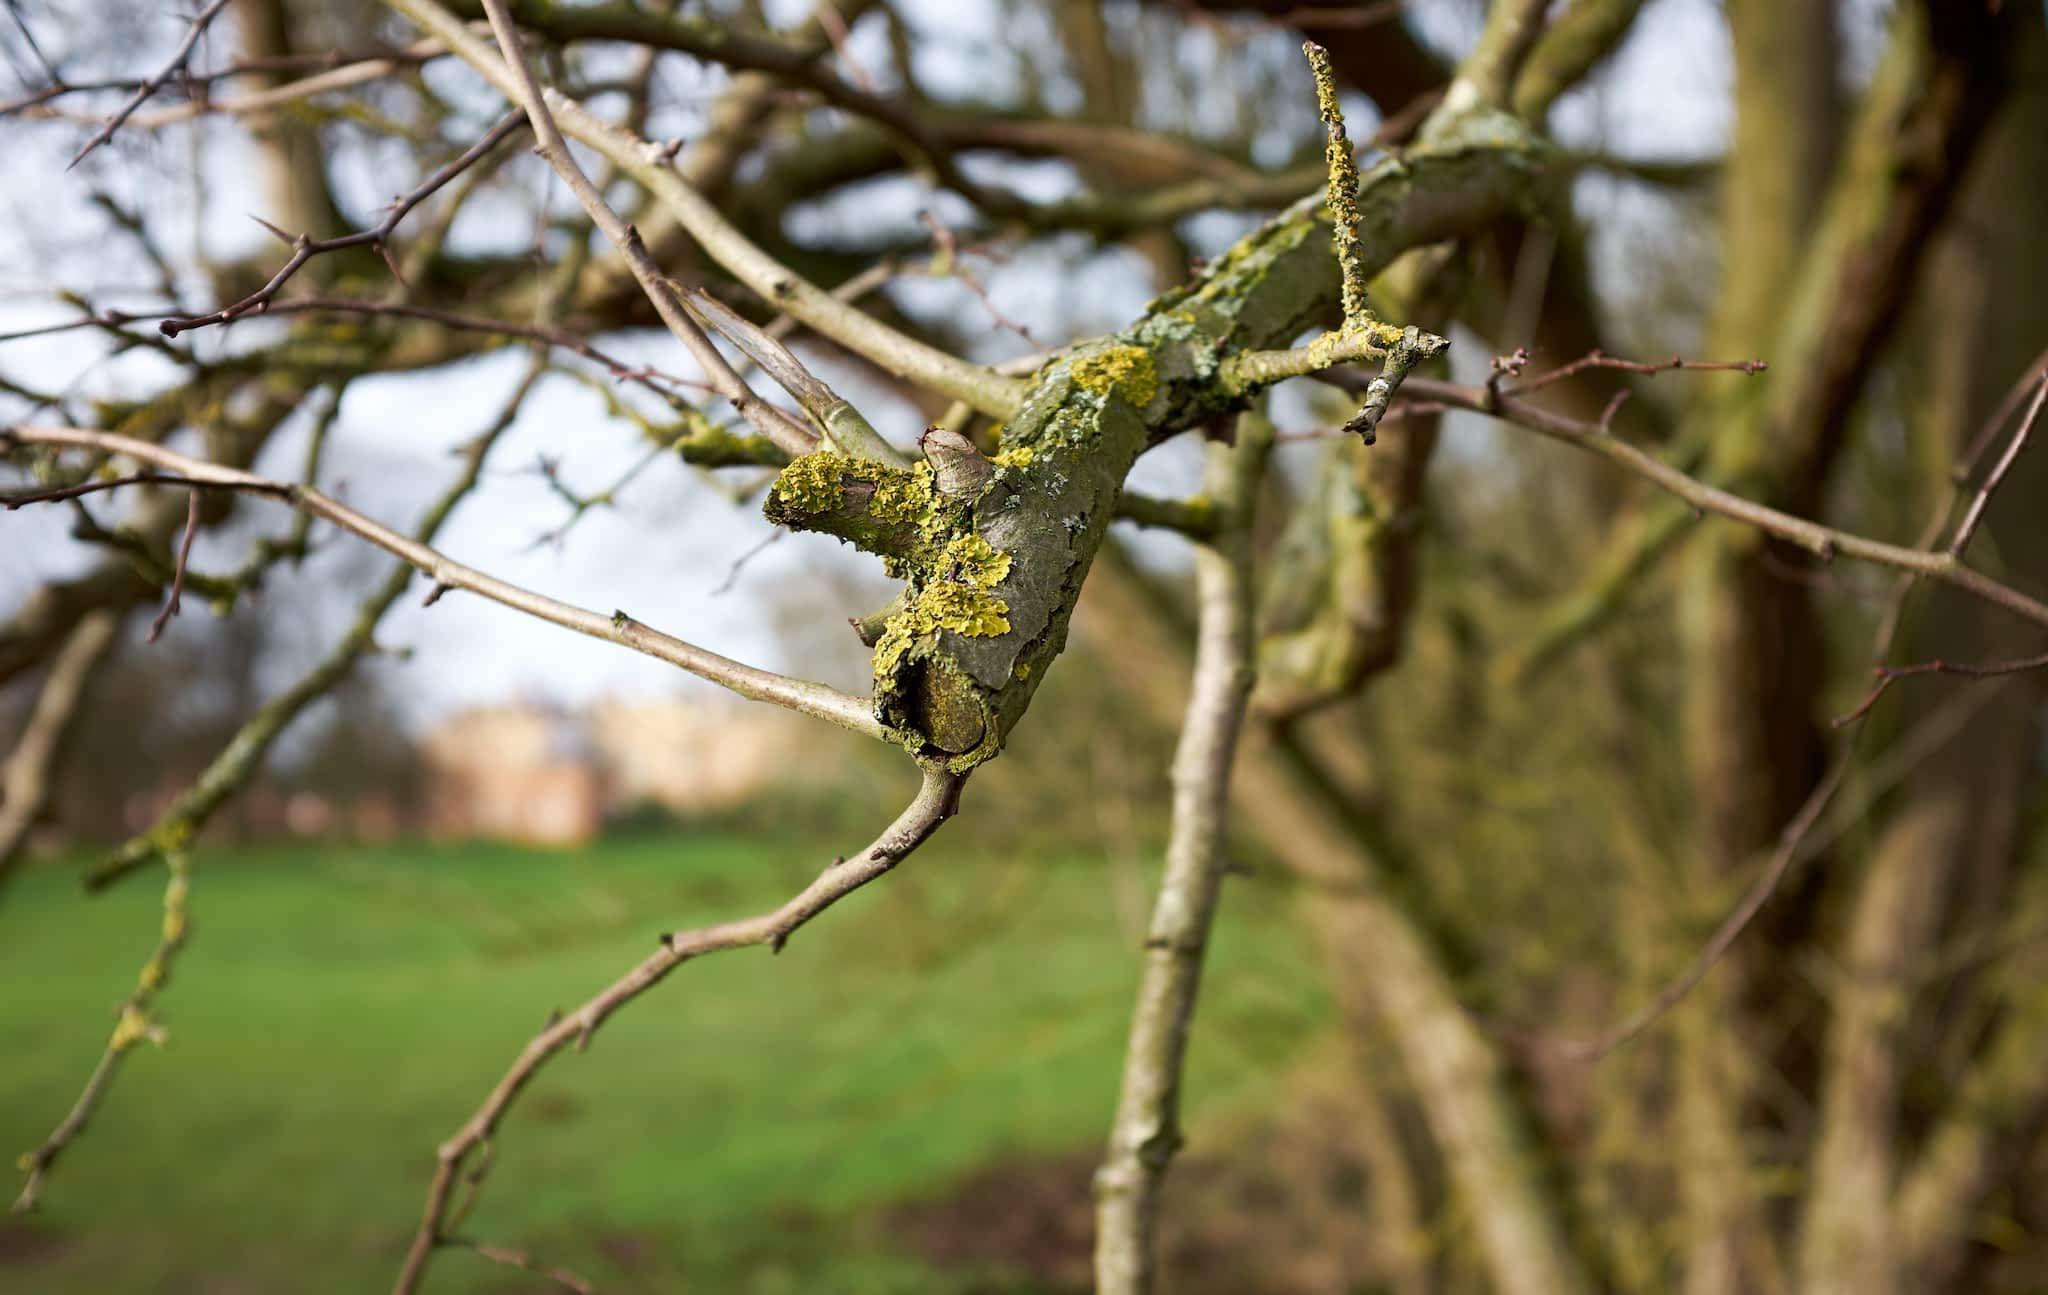 lichen-covered branches